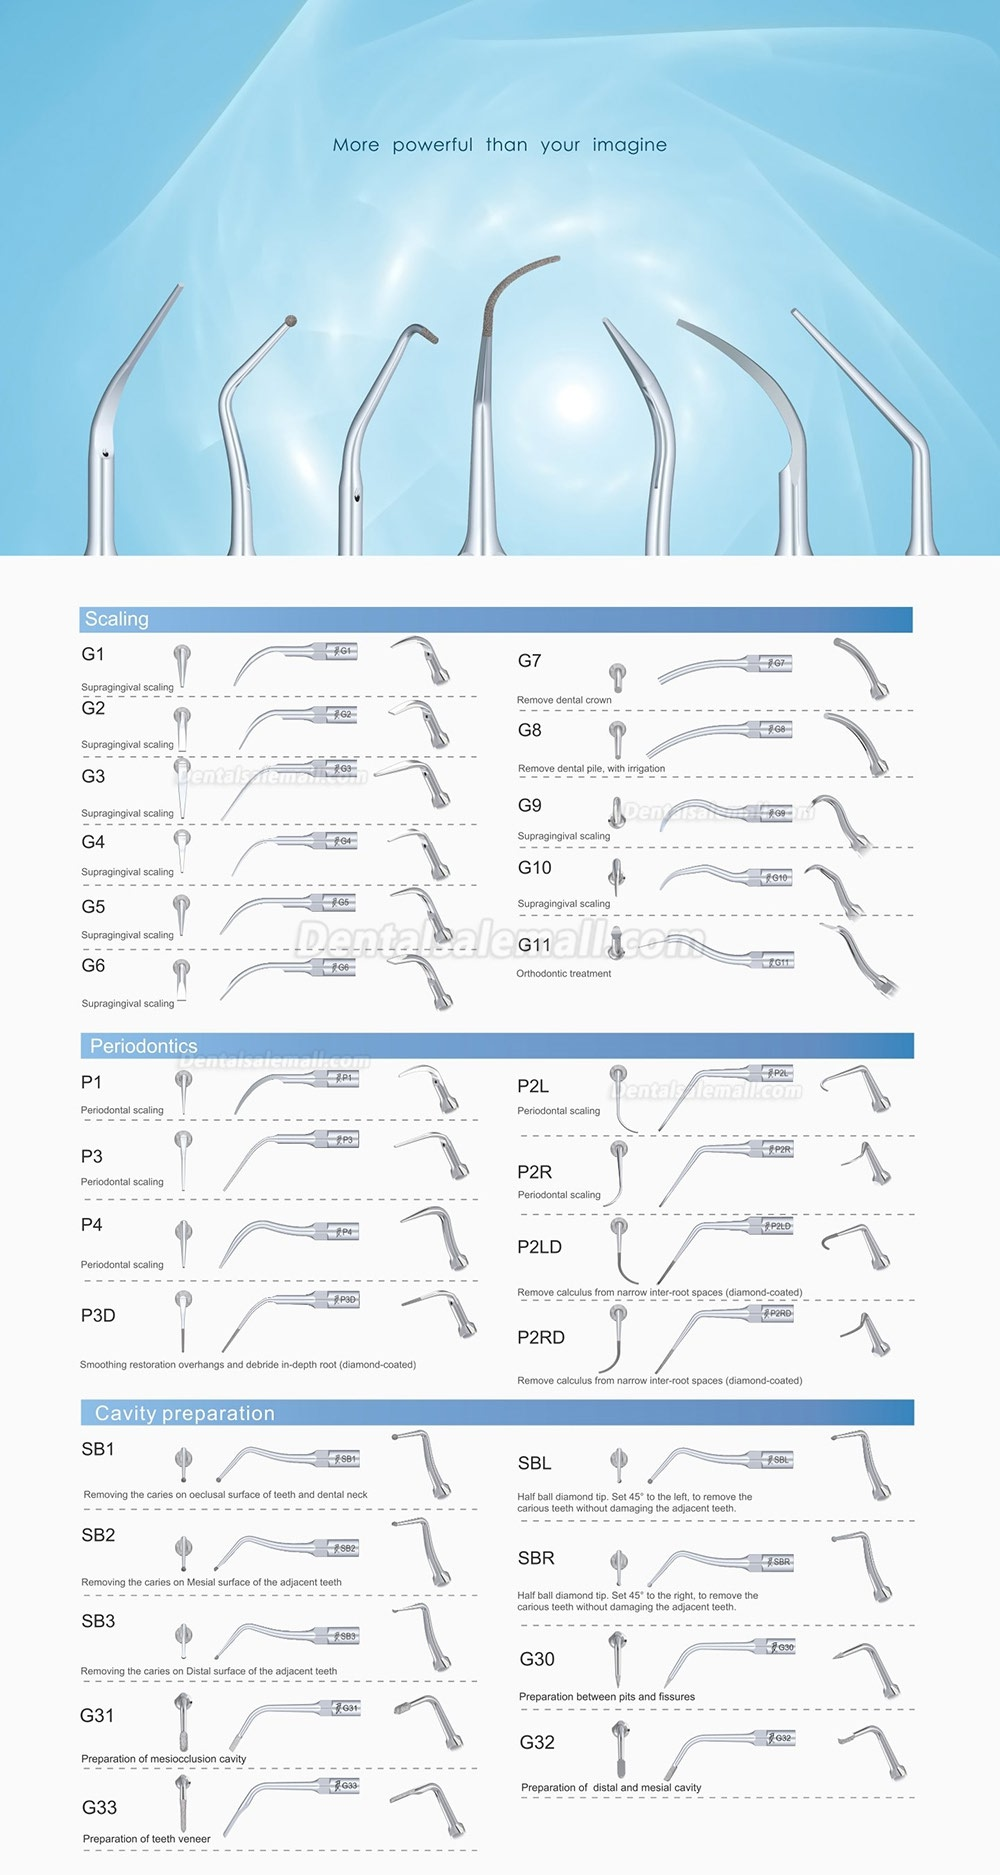 10Pcs Woodpecker EMS Cavitron Ultrasonic Scaler Endodontic Tip E1 E2 E3 E3D E4 E4D E5 E5D E8 E9 E10D E11 E11D E14